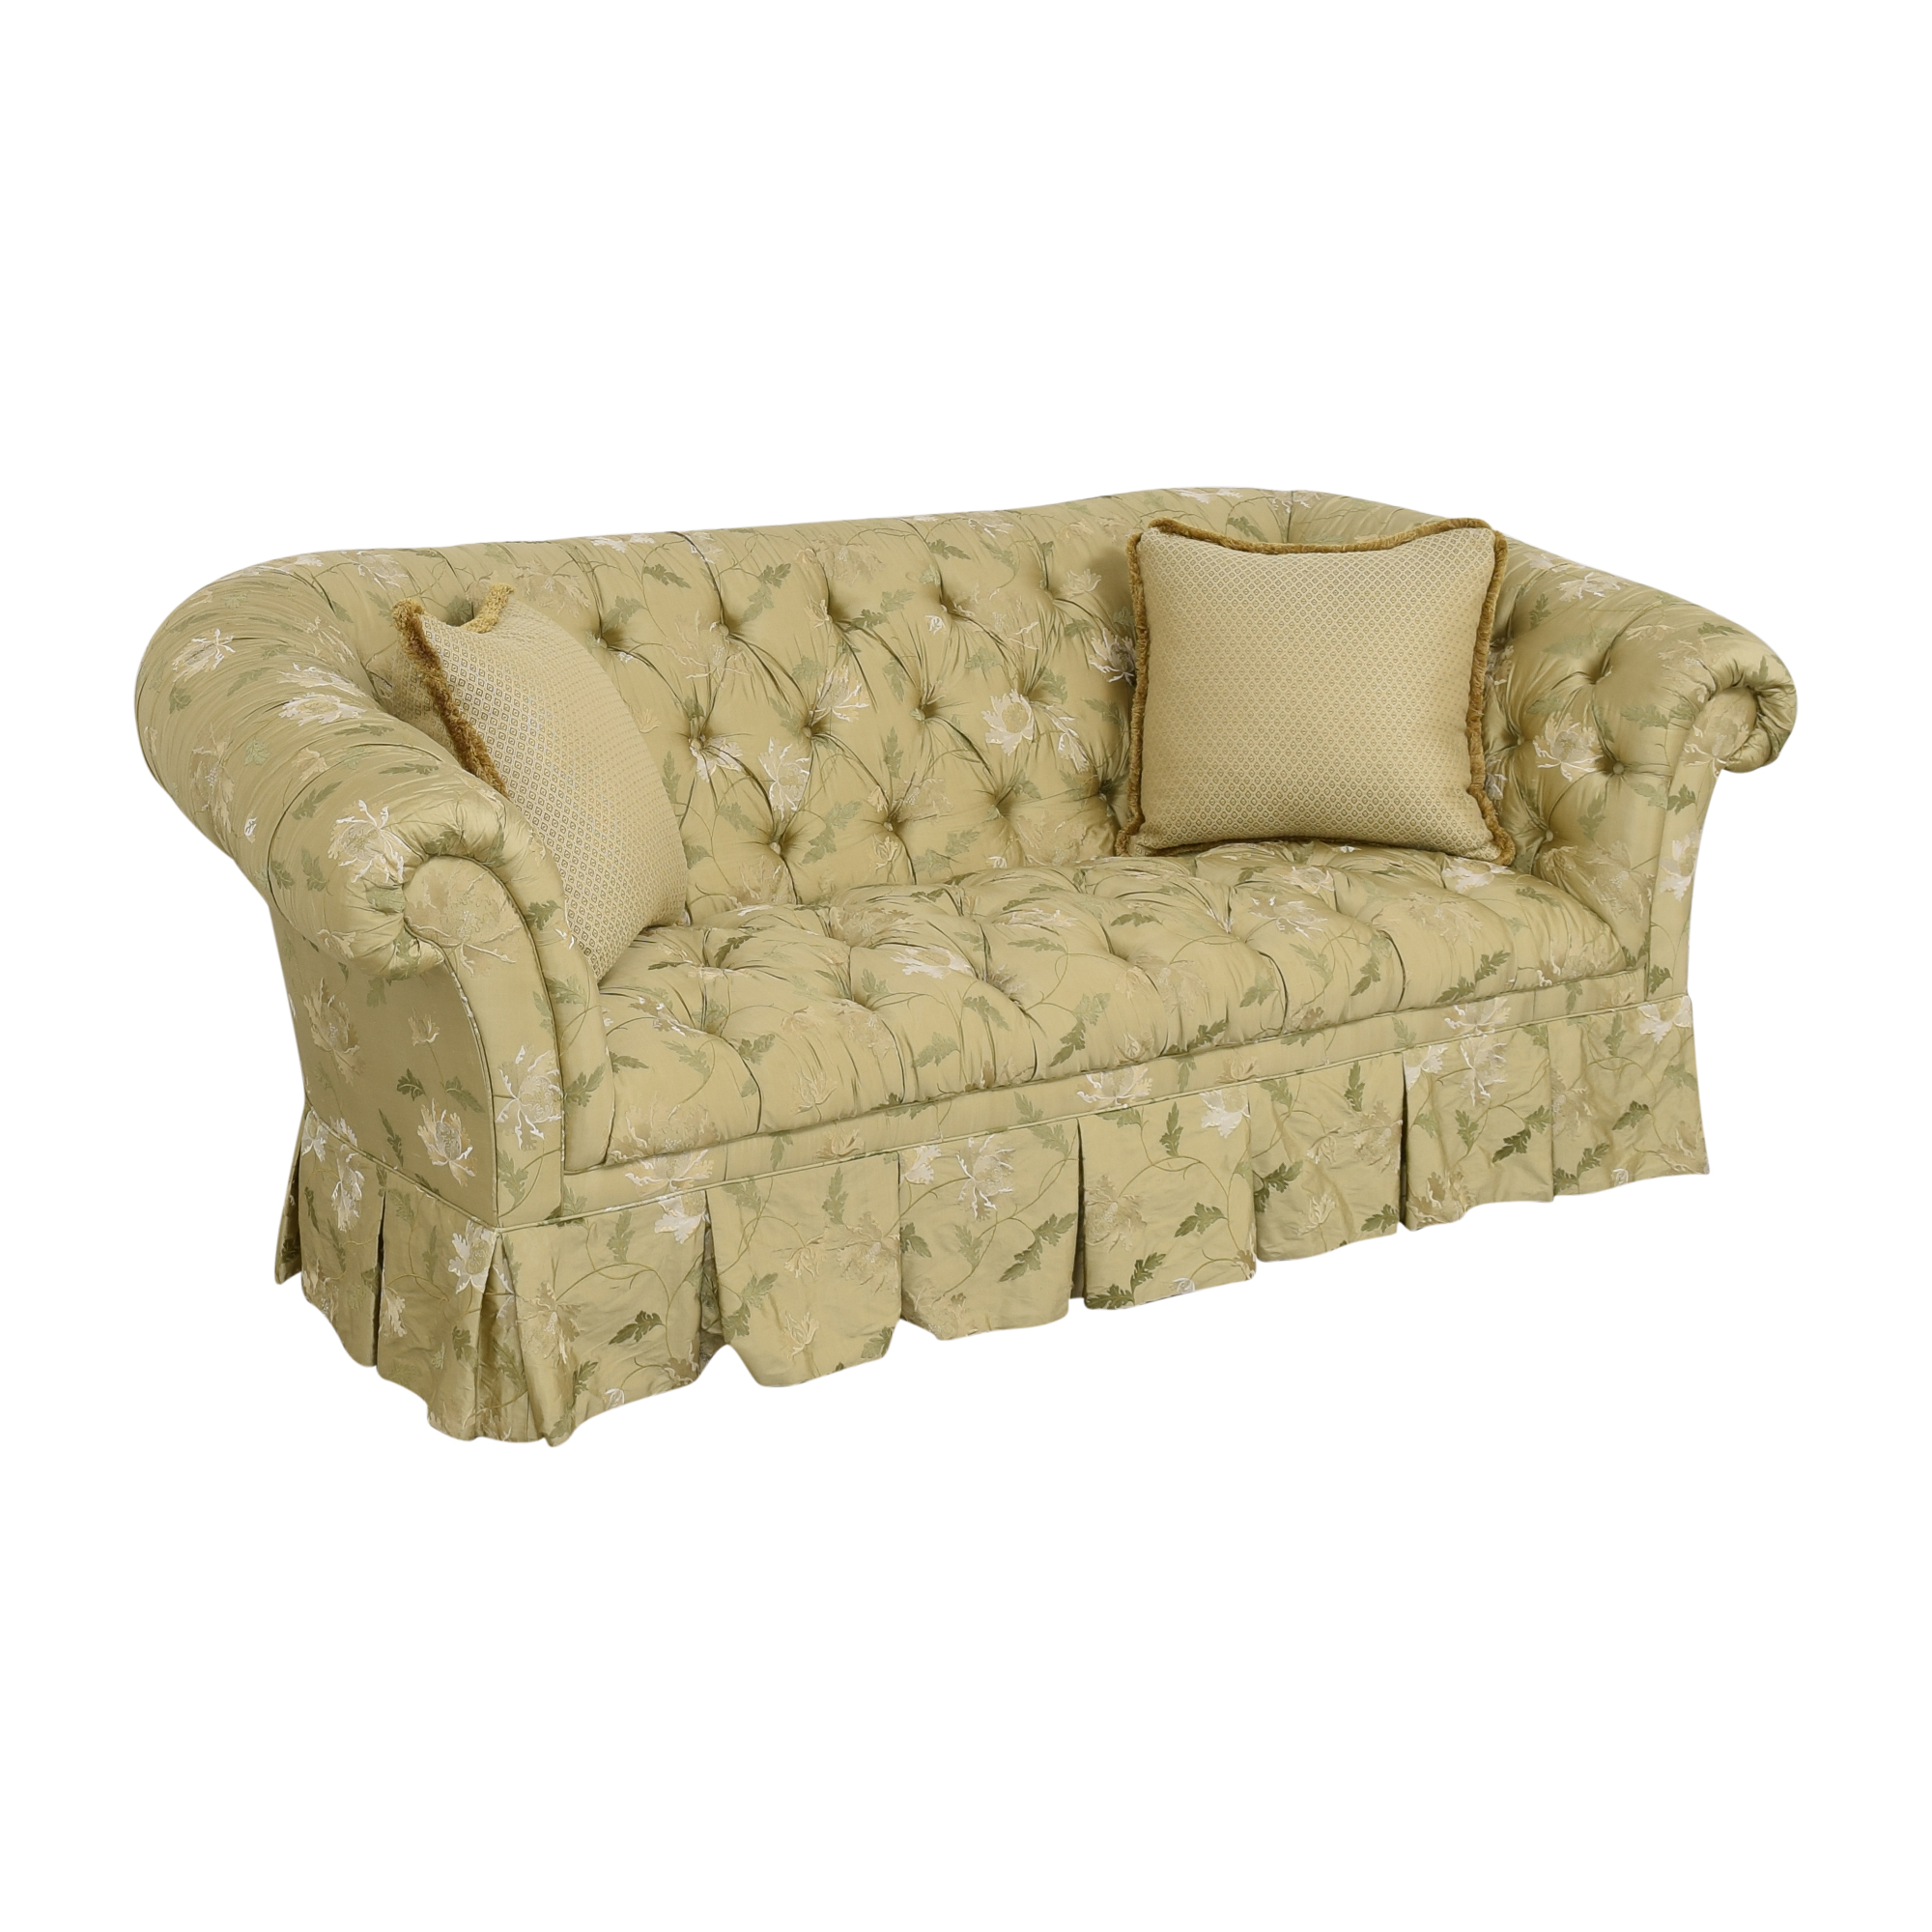 shop Lillian August Lillian August Chesterfield Sofa online